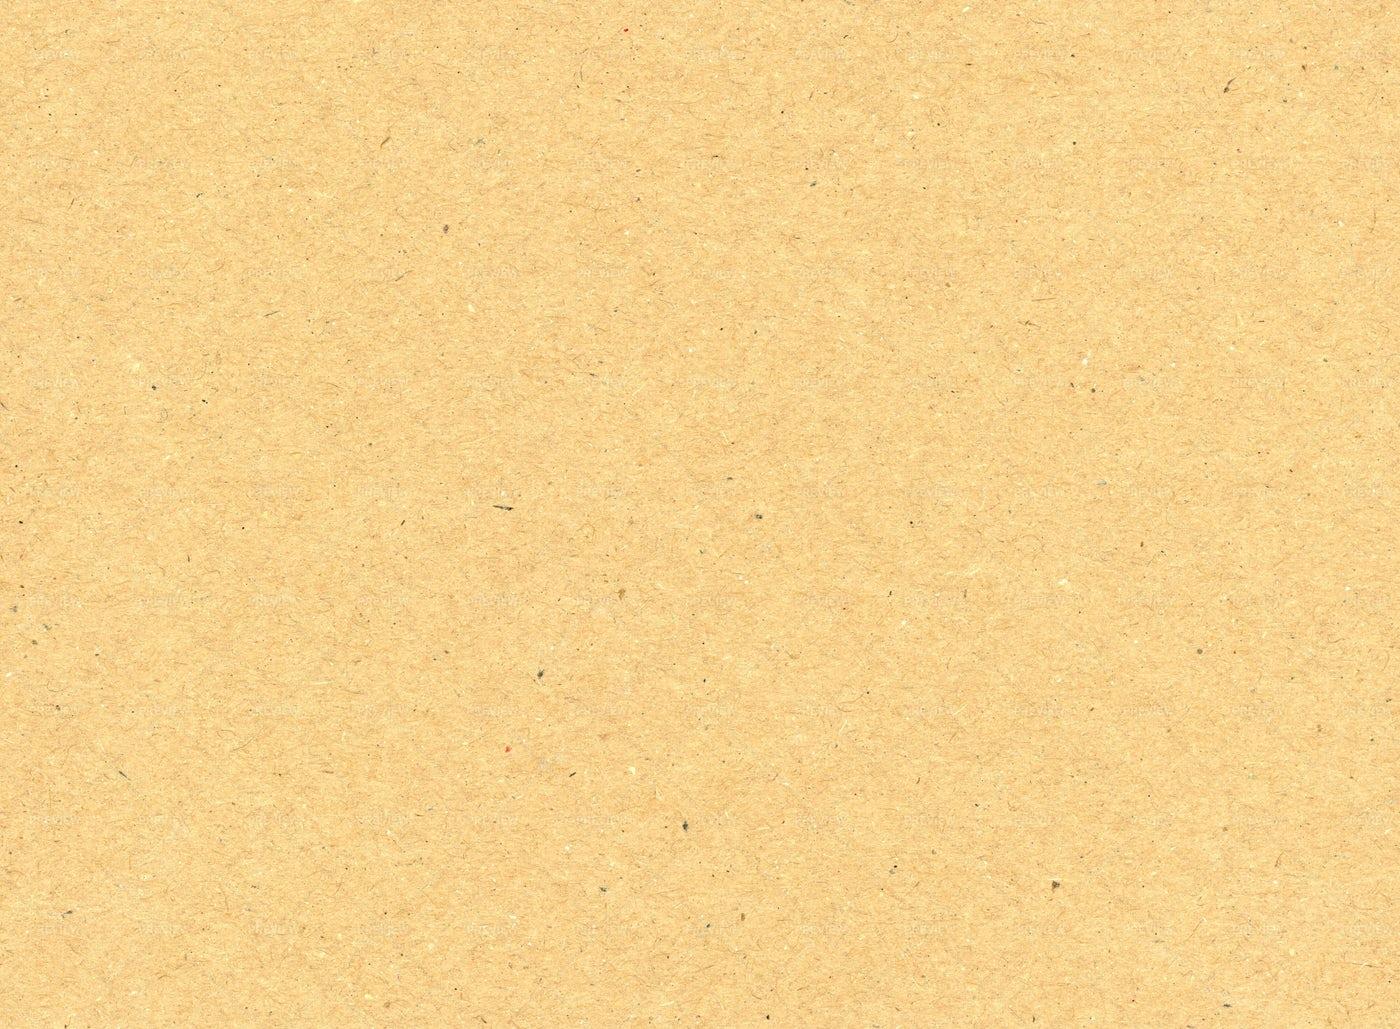 Brown Paper Parchment Close-Up: Stock Photos